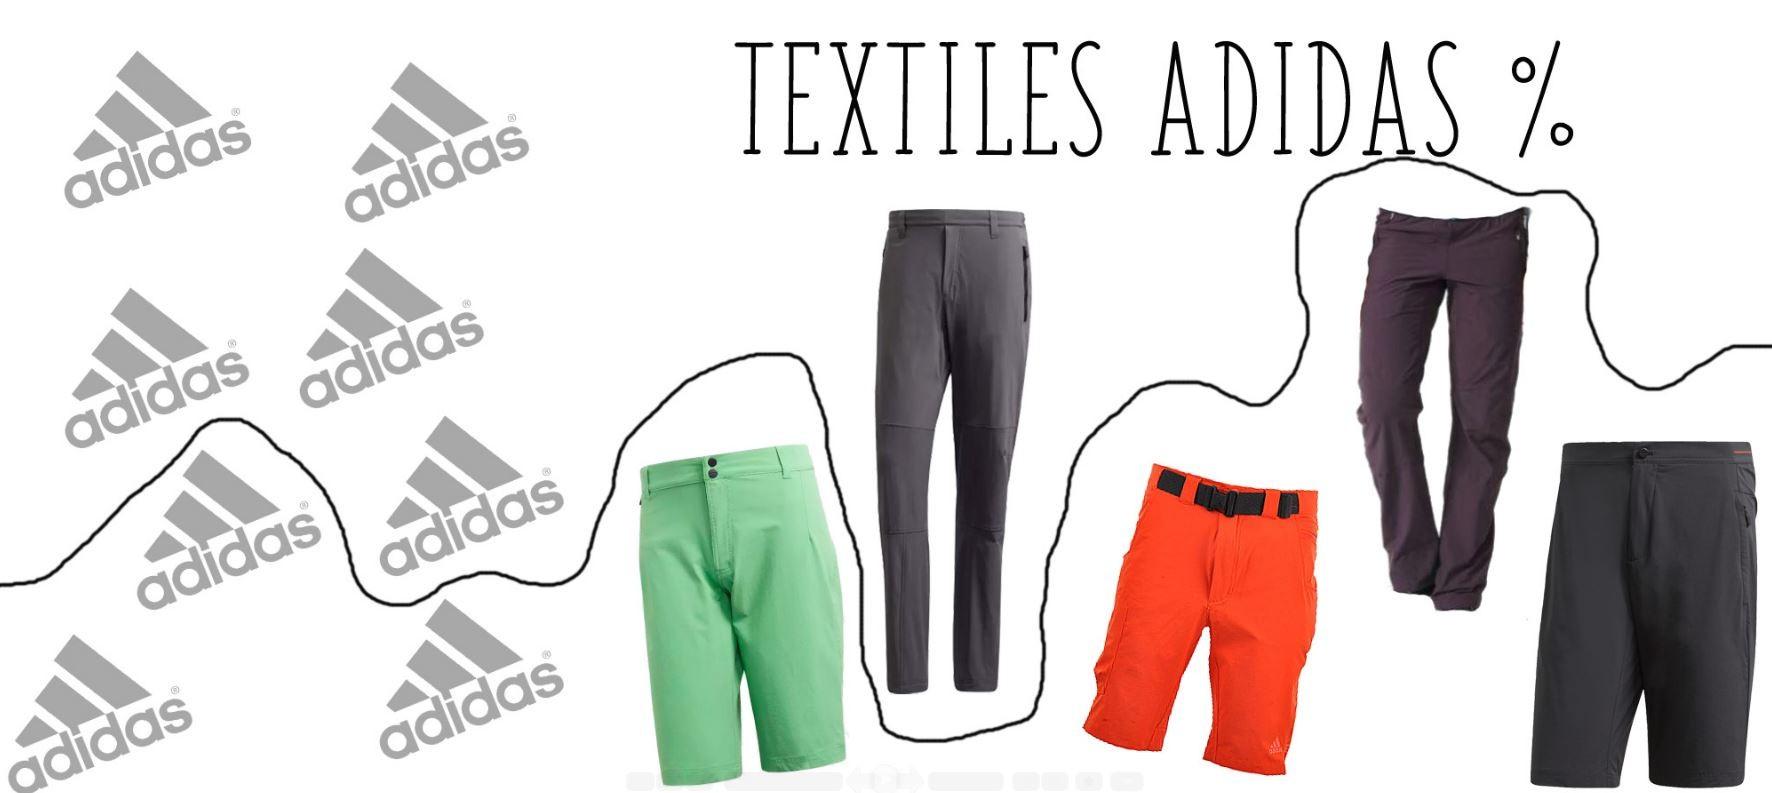 ADIDAS TEXTILES